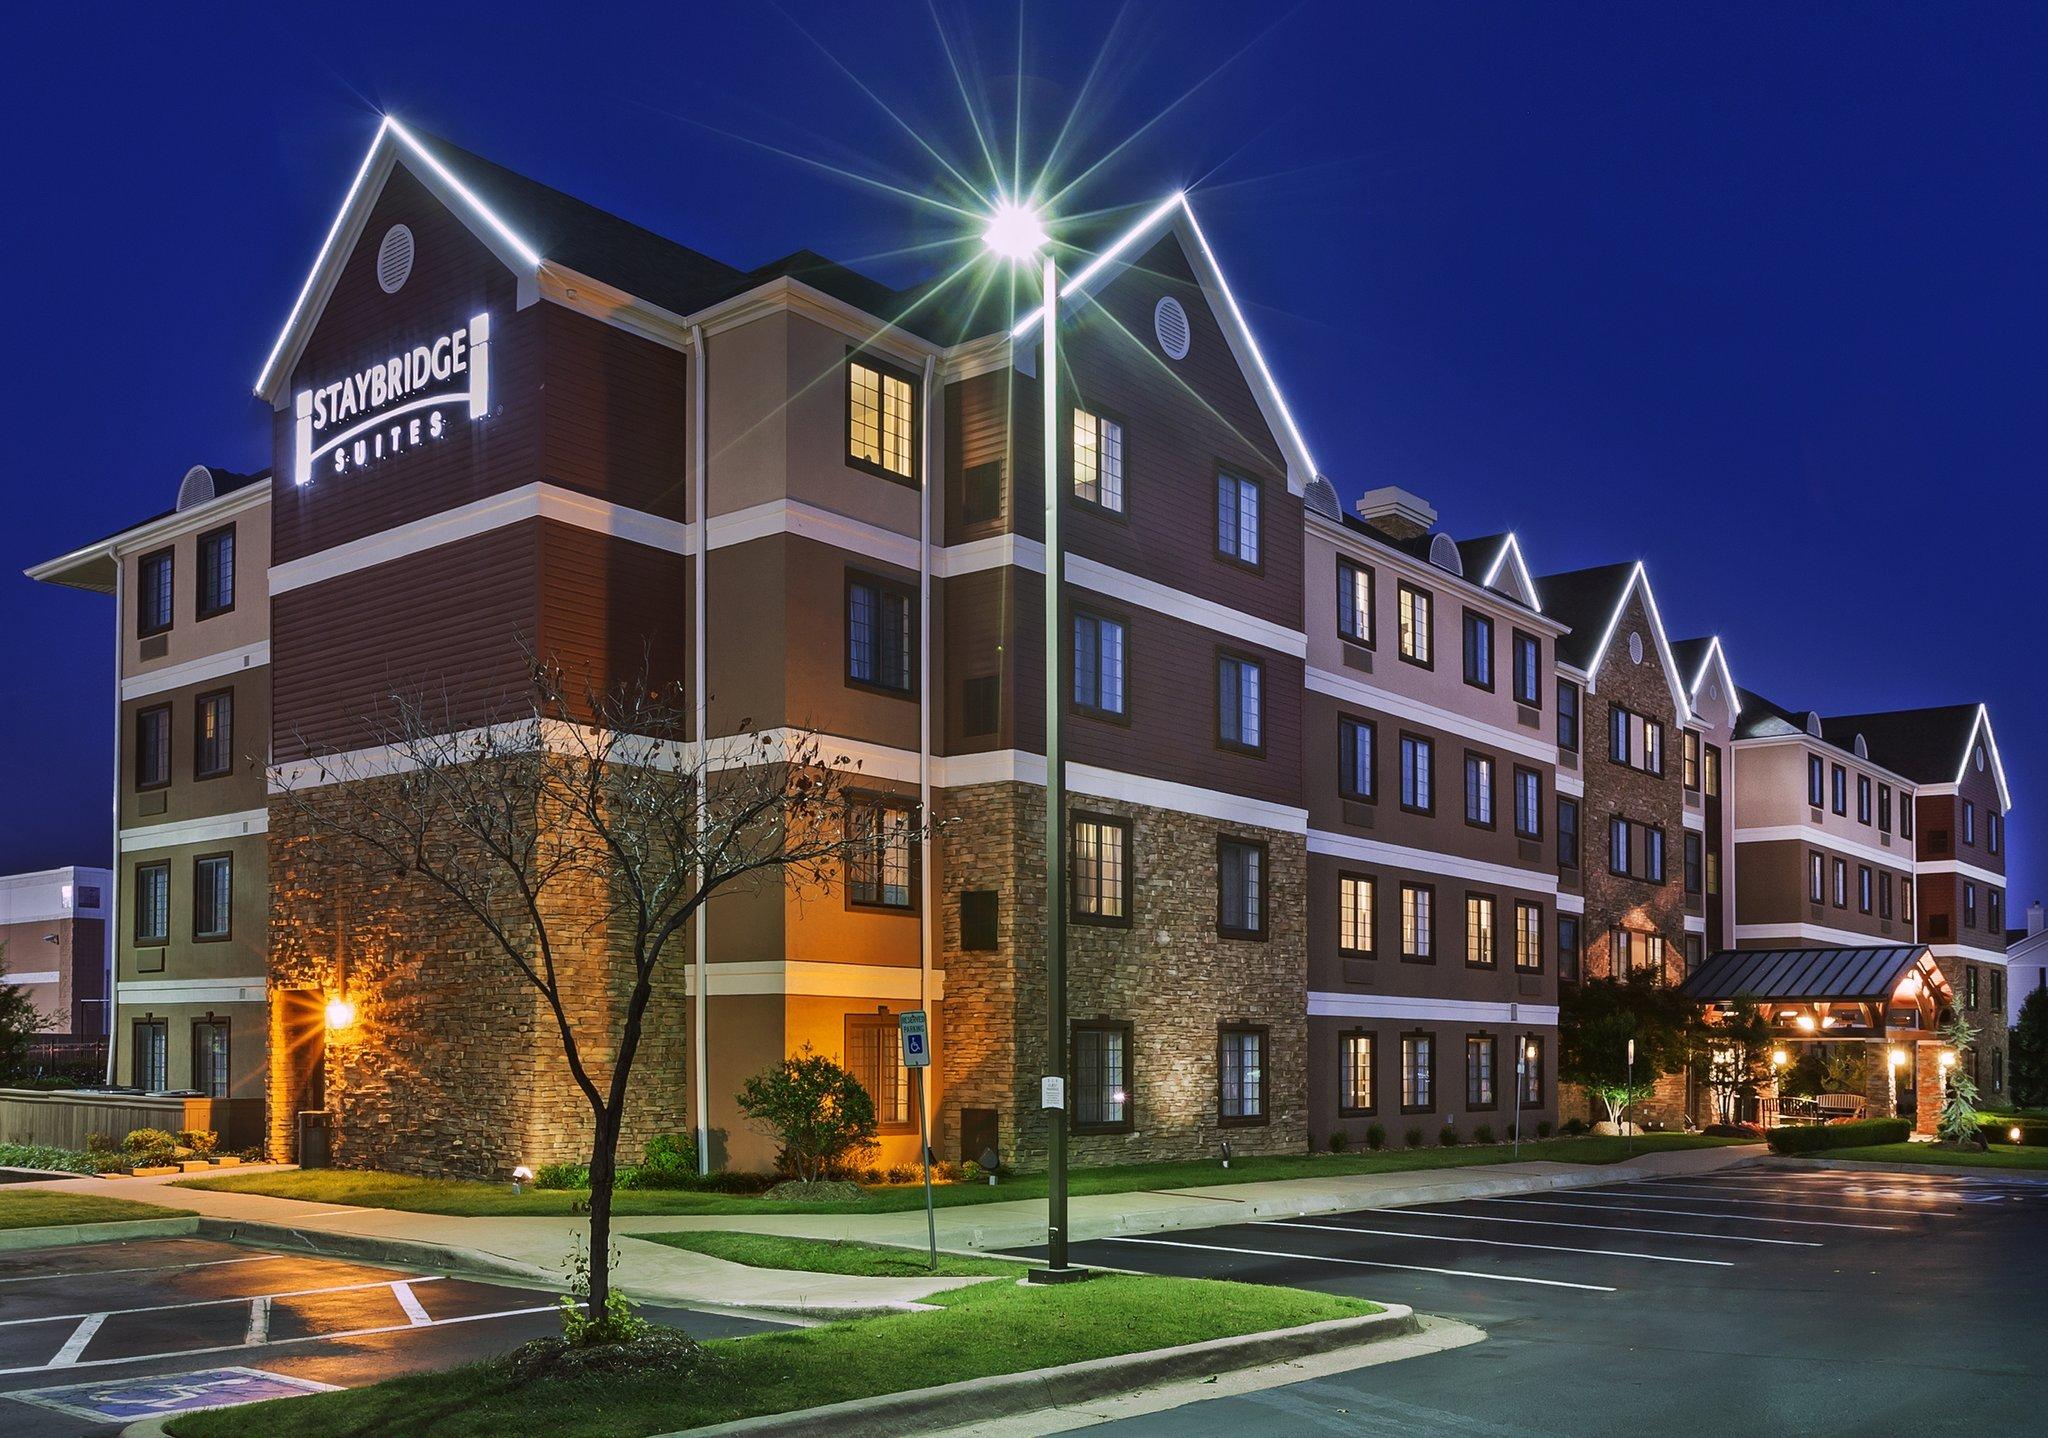 Staybridge suites hotel tulsa woodland hills updated 2017 prices reviews ok tripadvisor